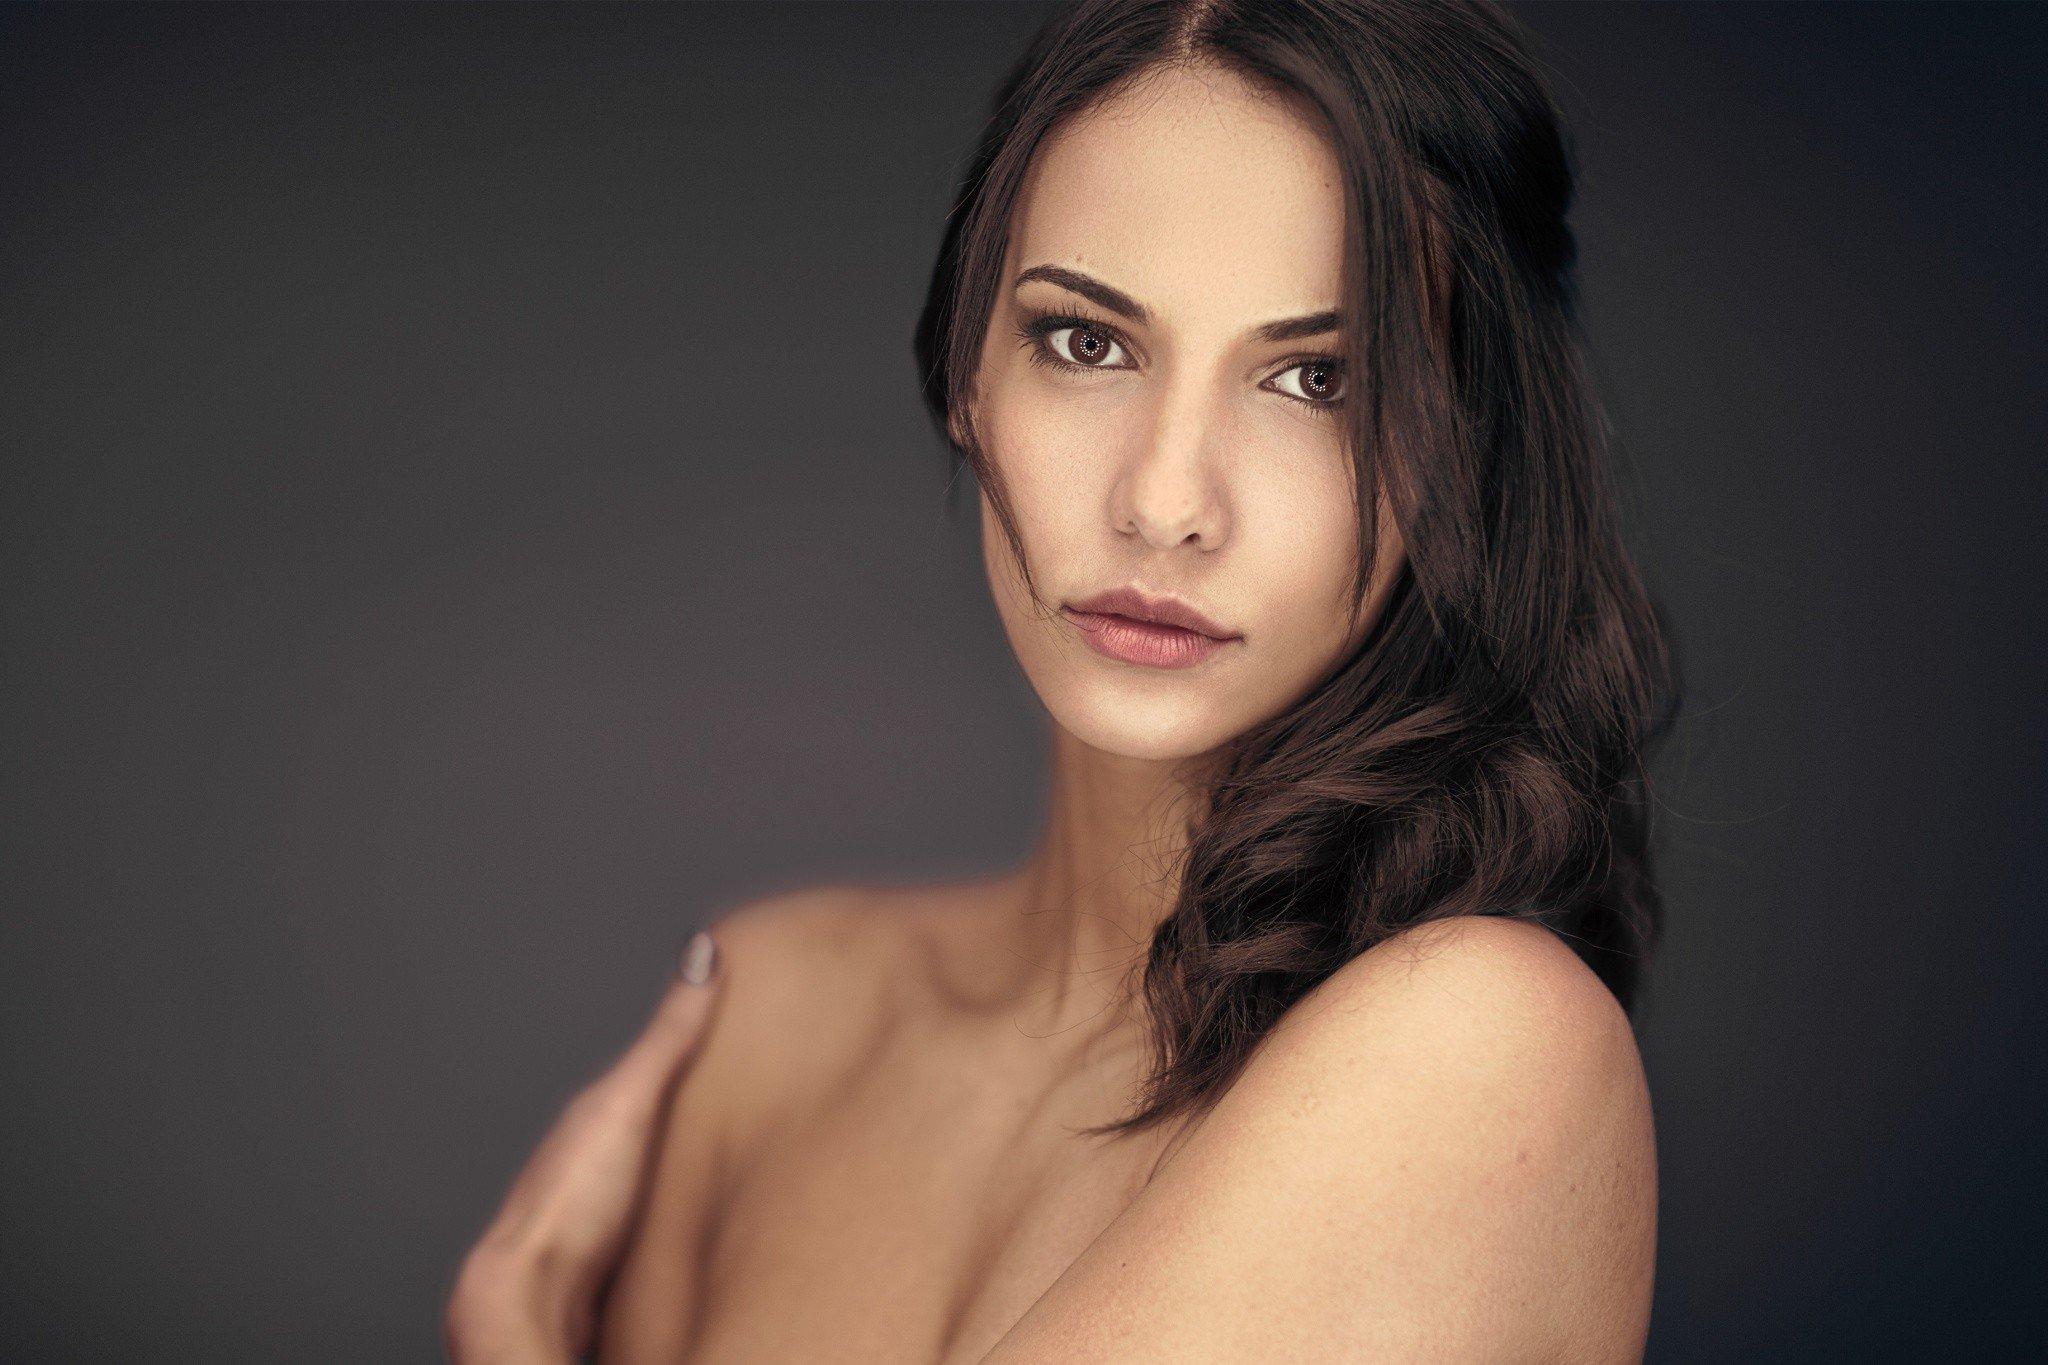 Women, Model, Brunette, Brown Eyes, Bare Shoulders -6288